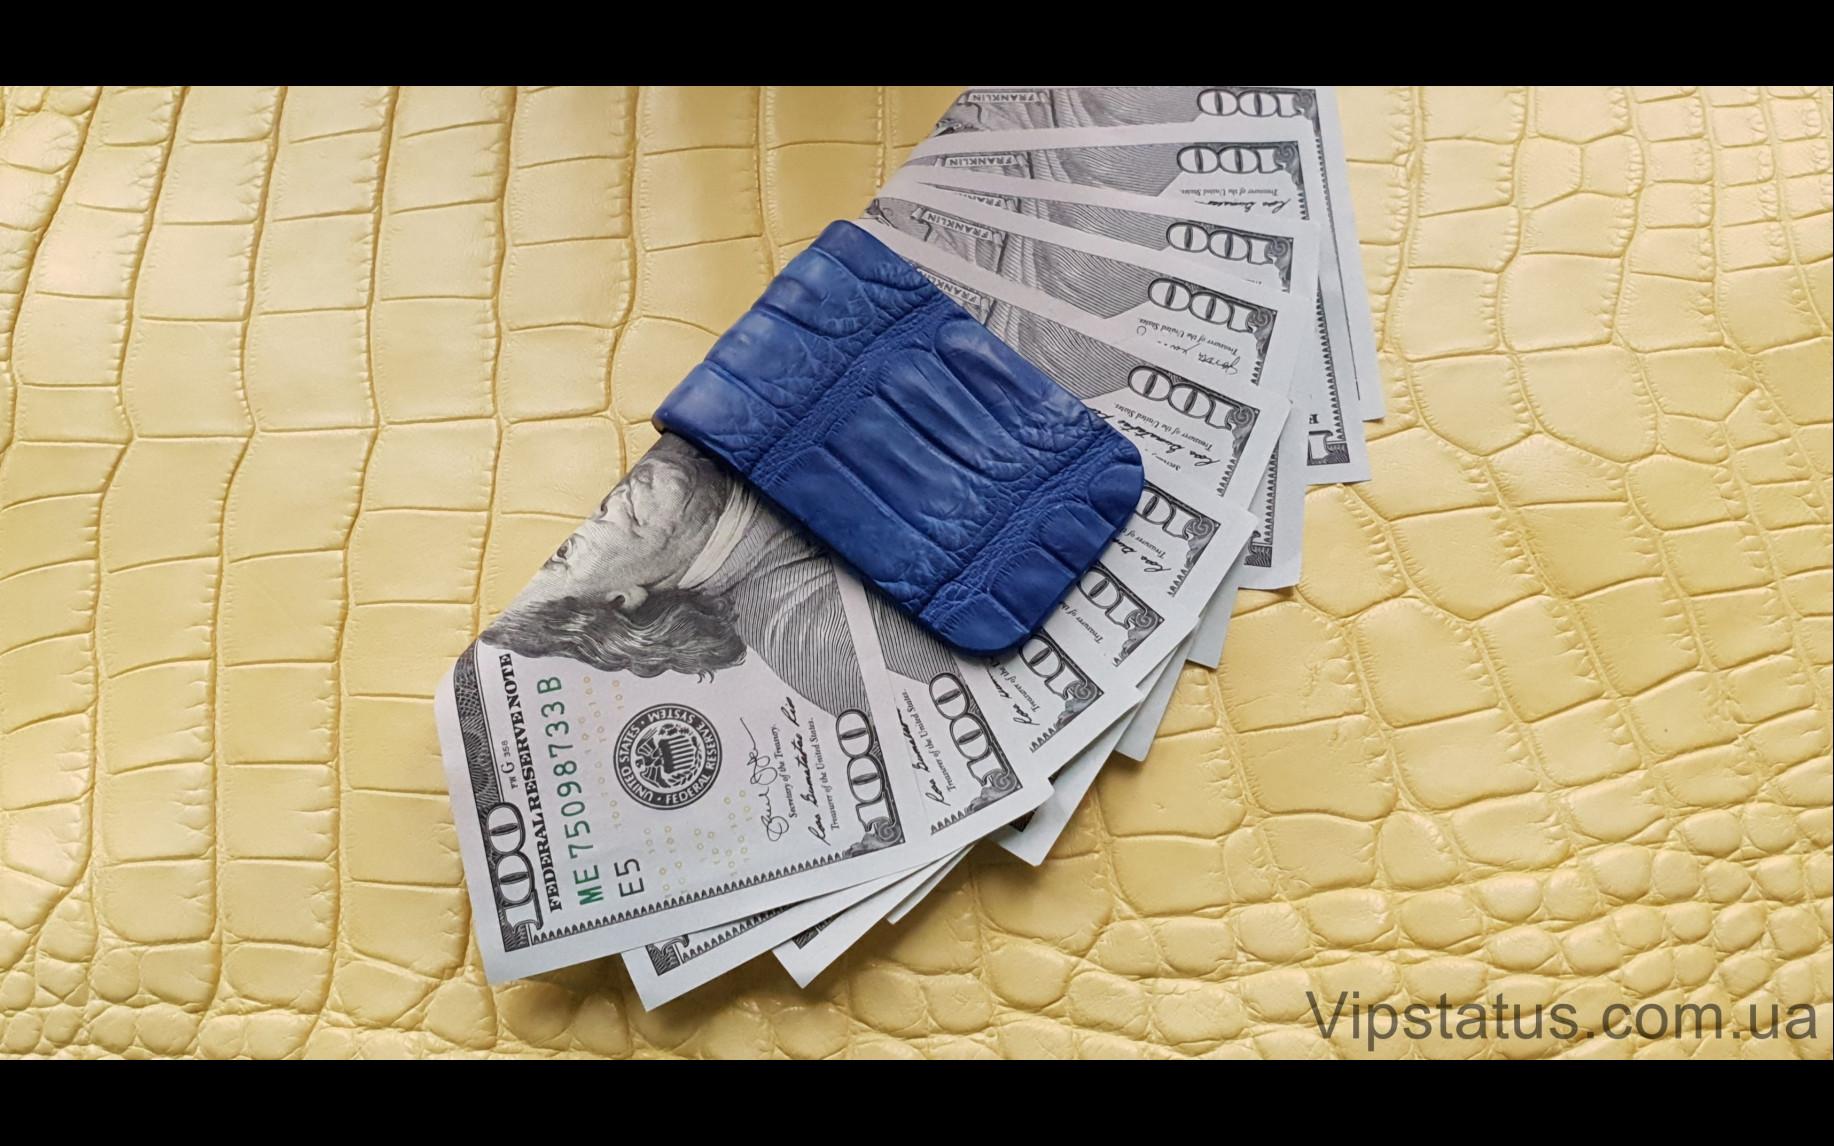 Elite Dark Blue Crocodile Вип зажим для купюр Dark Blue Crocodile Vip bill clip image 2